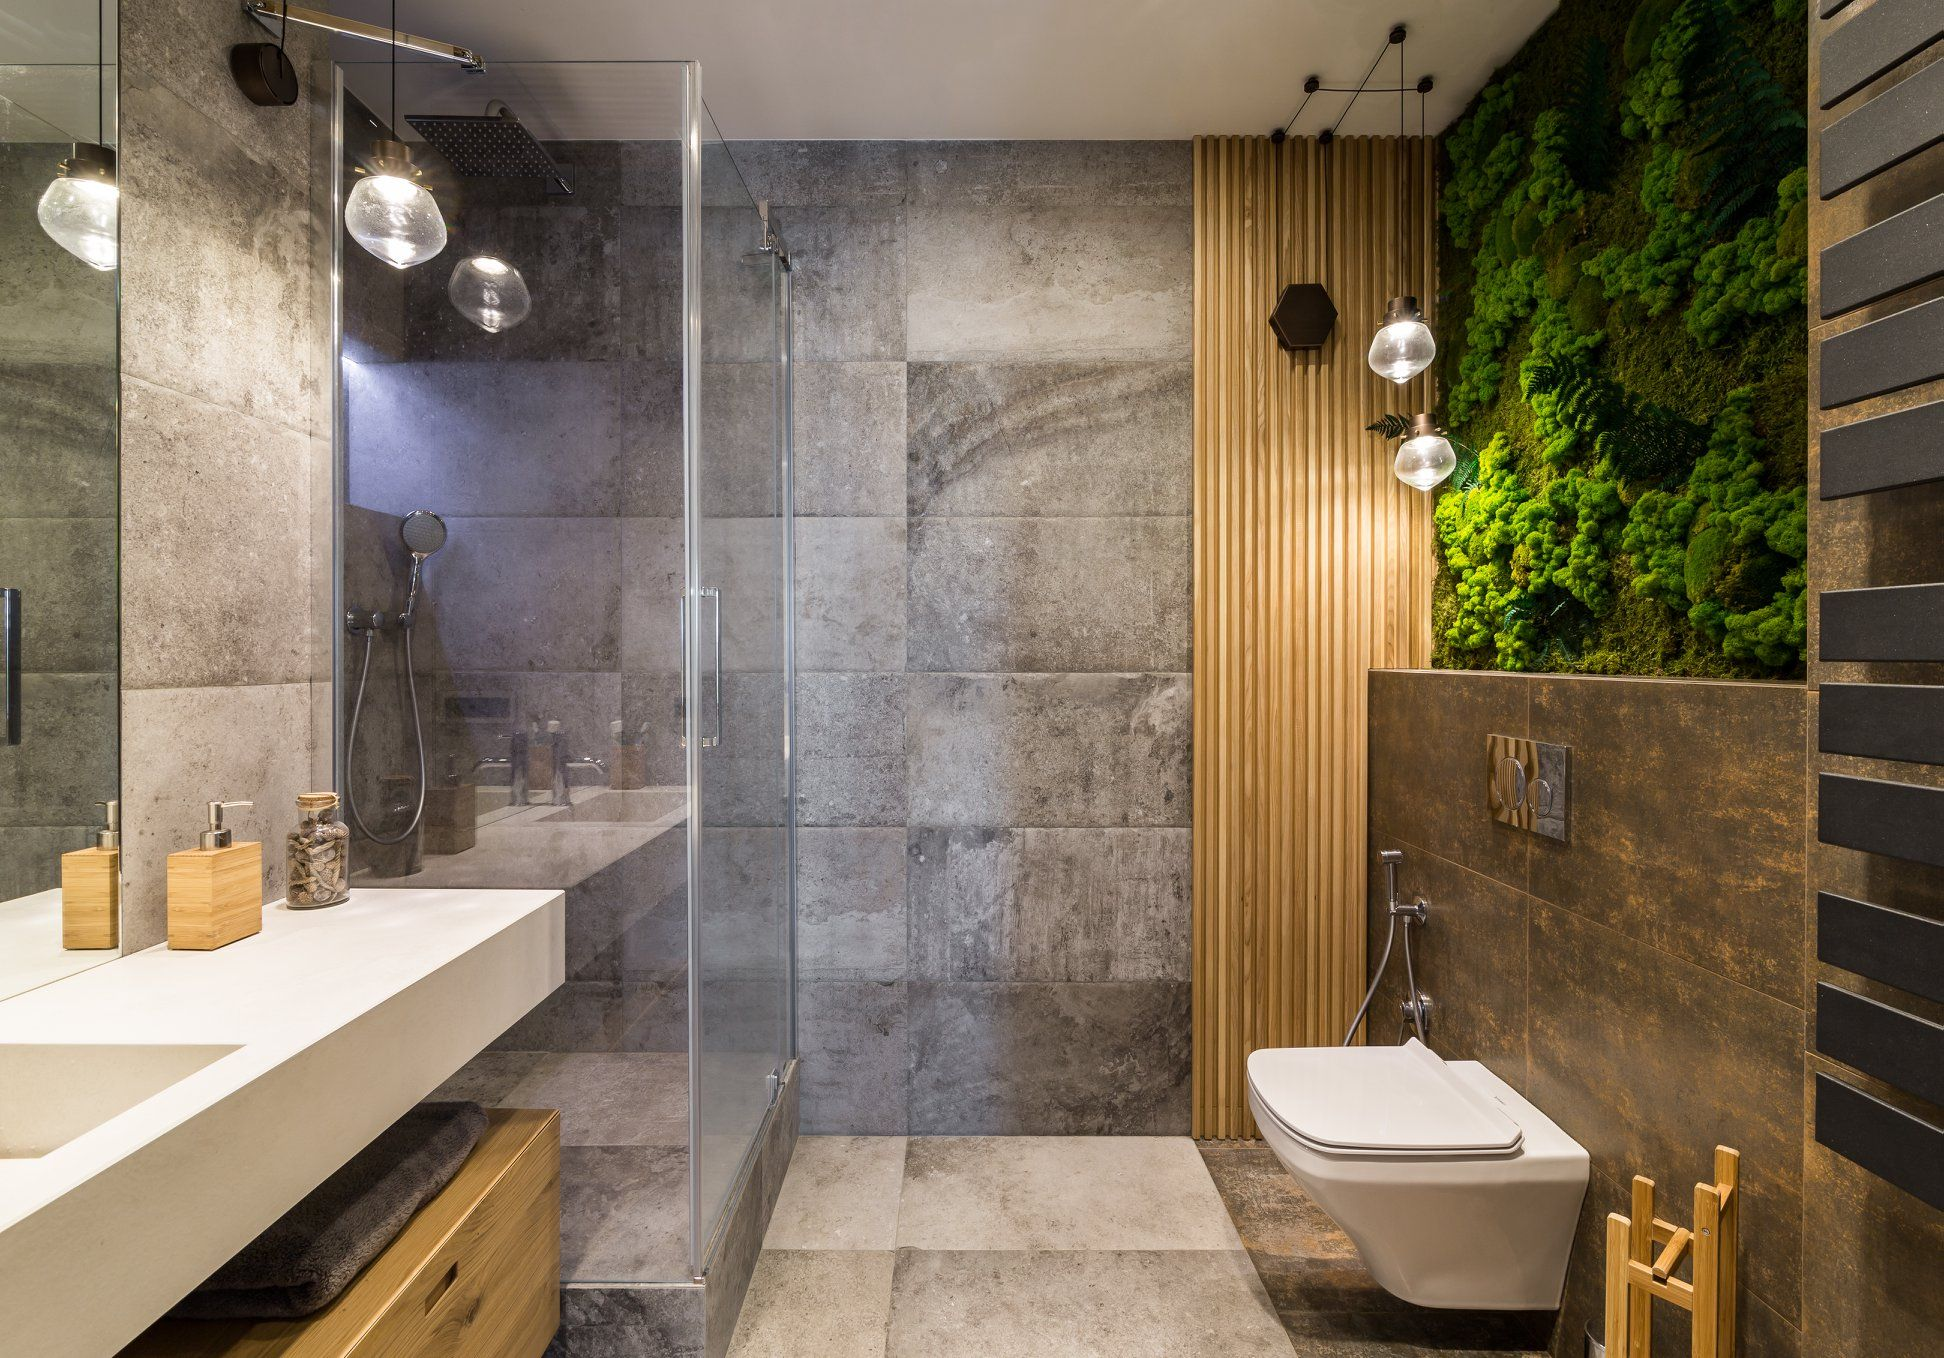 Wooden Panels Batten Plank And Moss Stabilized Featured In Bathroom Interior Bathroom Wall Panels Stylish Bathroom Bathroom Design